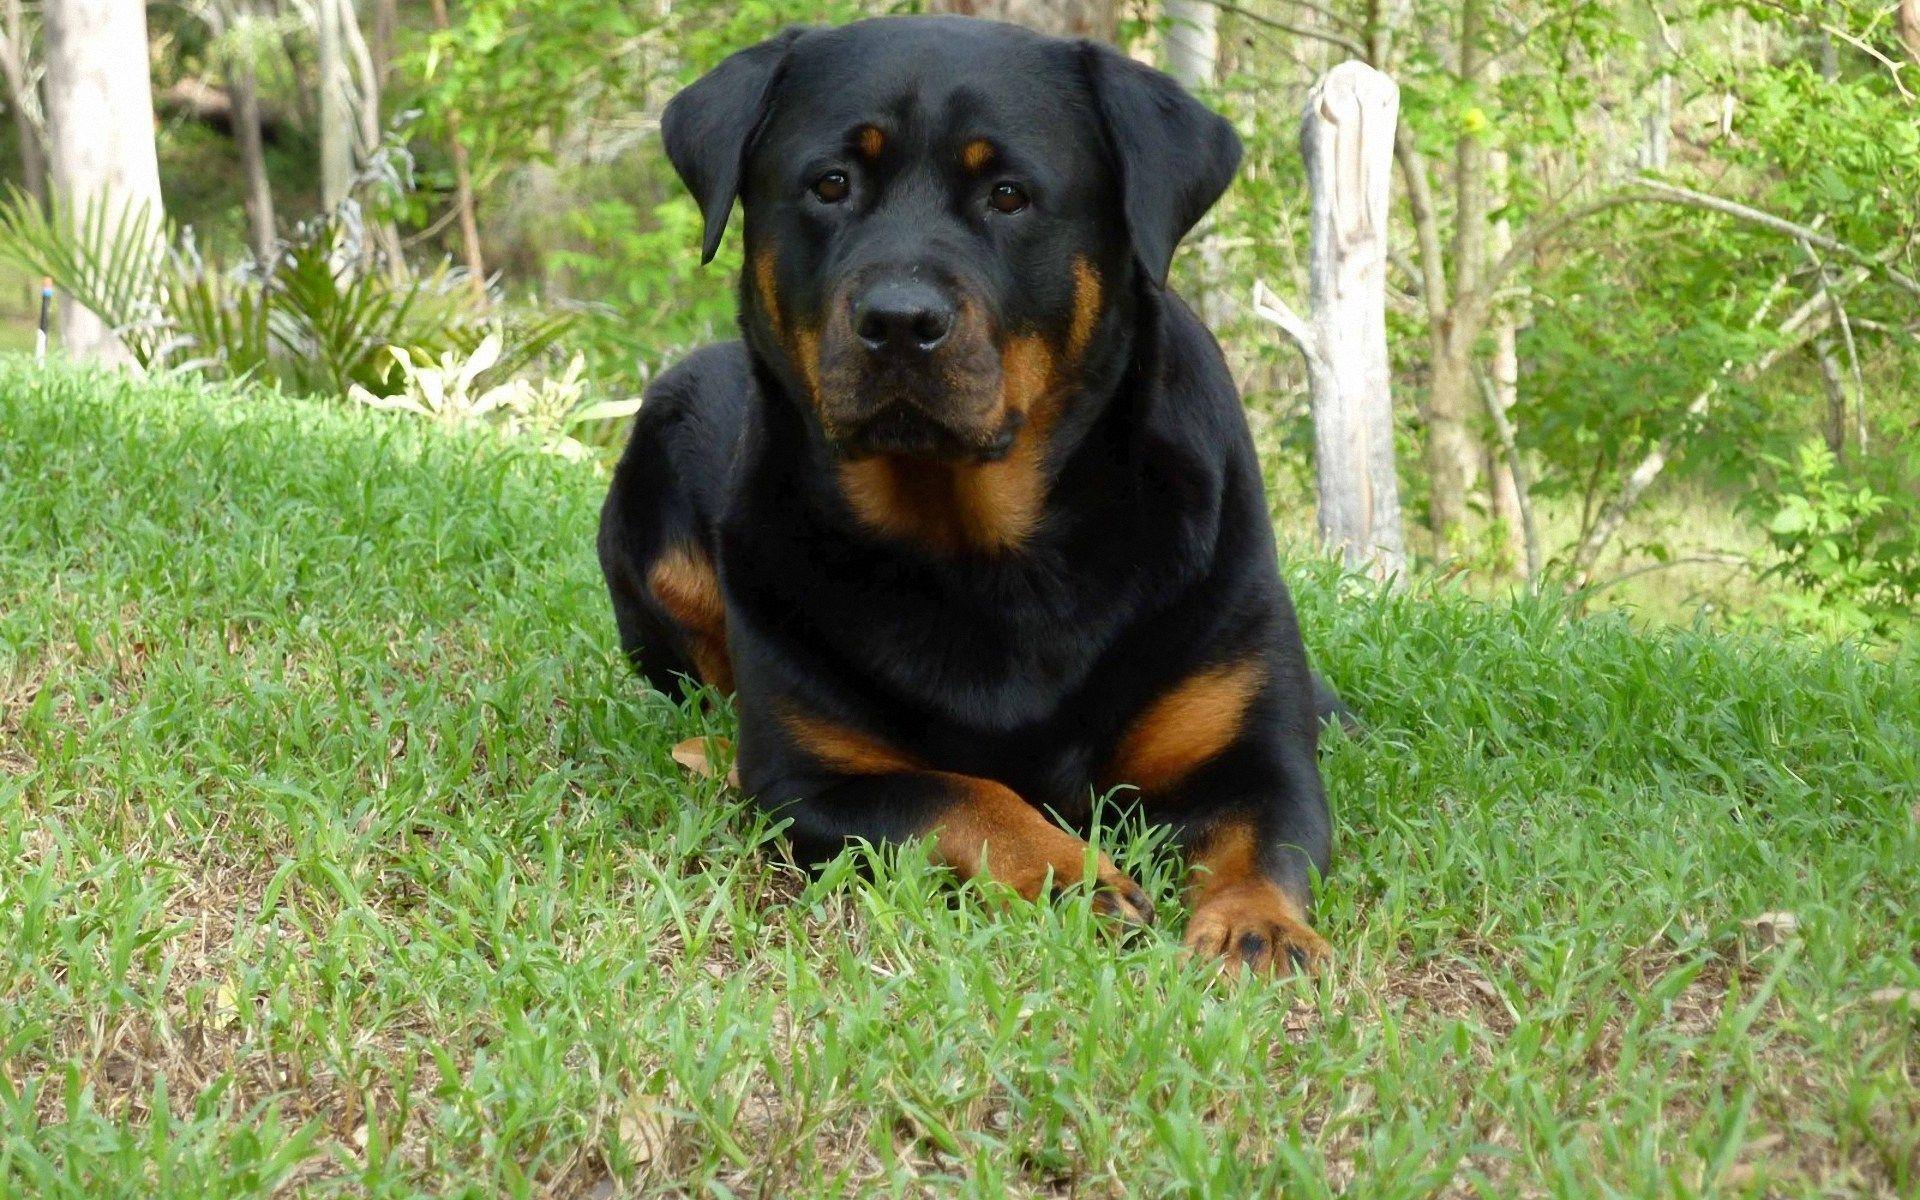 Rottweiler Wallpapers - The Dog Wallpaper - Best The Dog Wallpaper